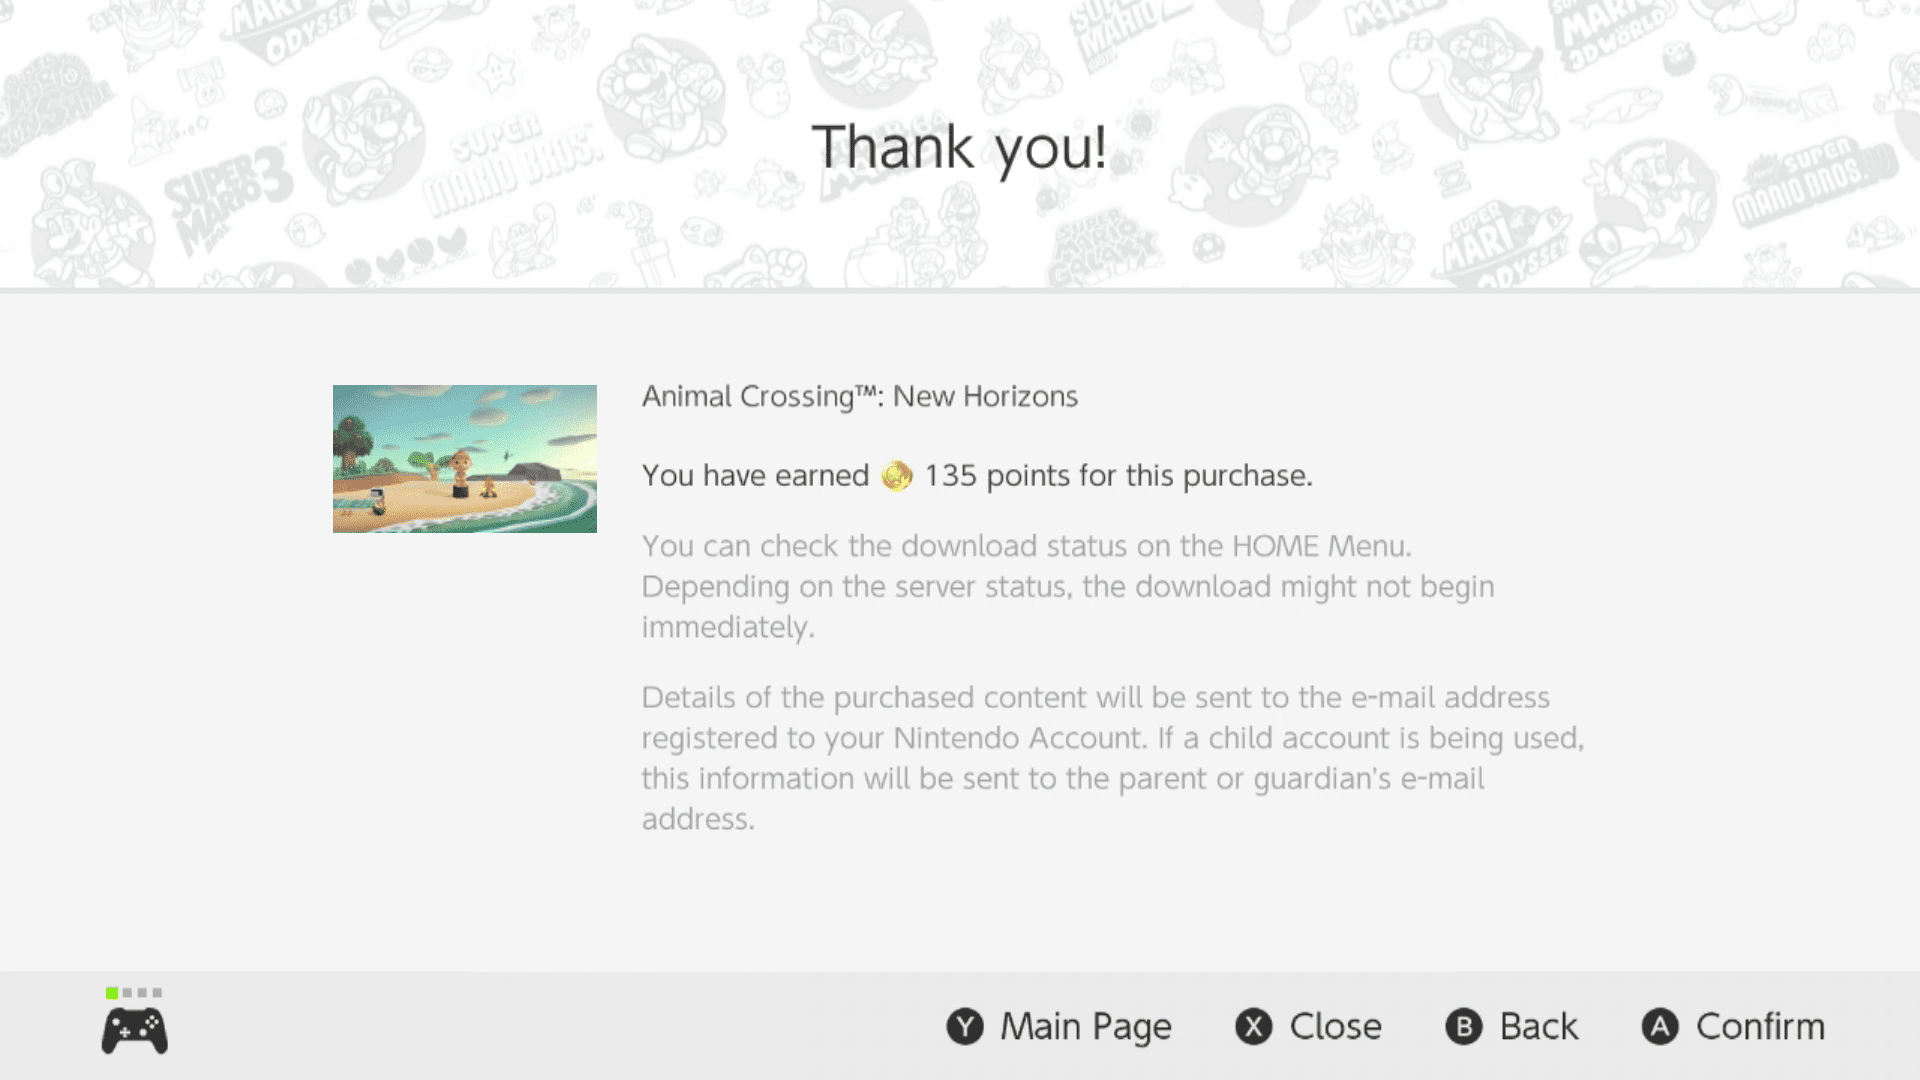 Animal Crossing: New Horizon purchased from the Nintendo eShop.